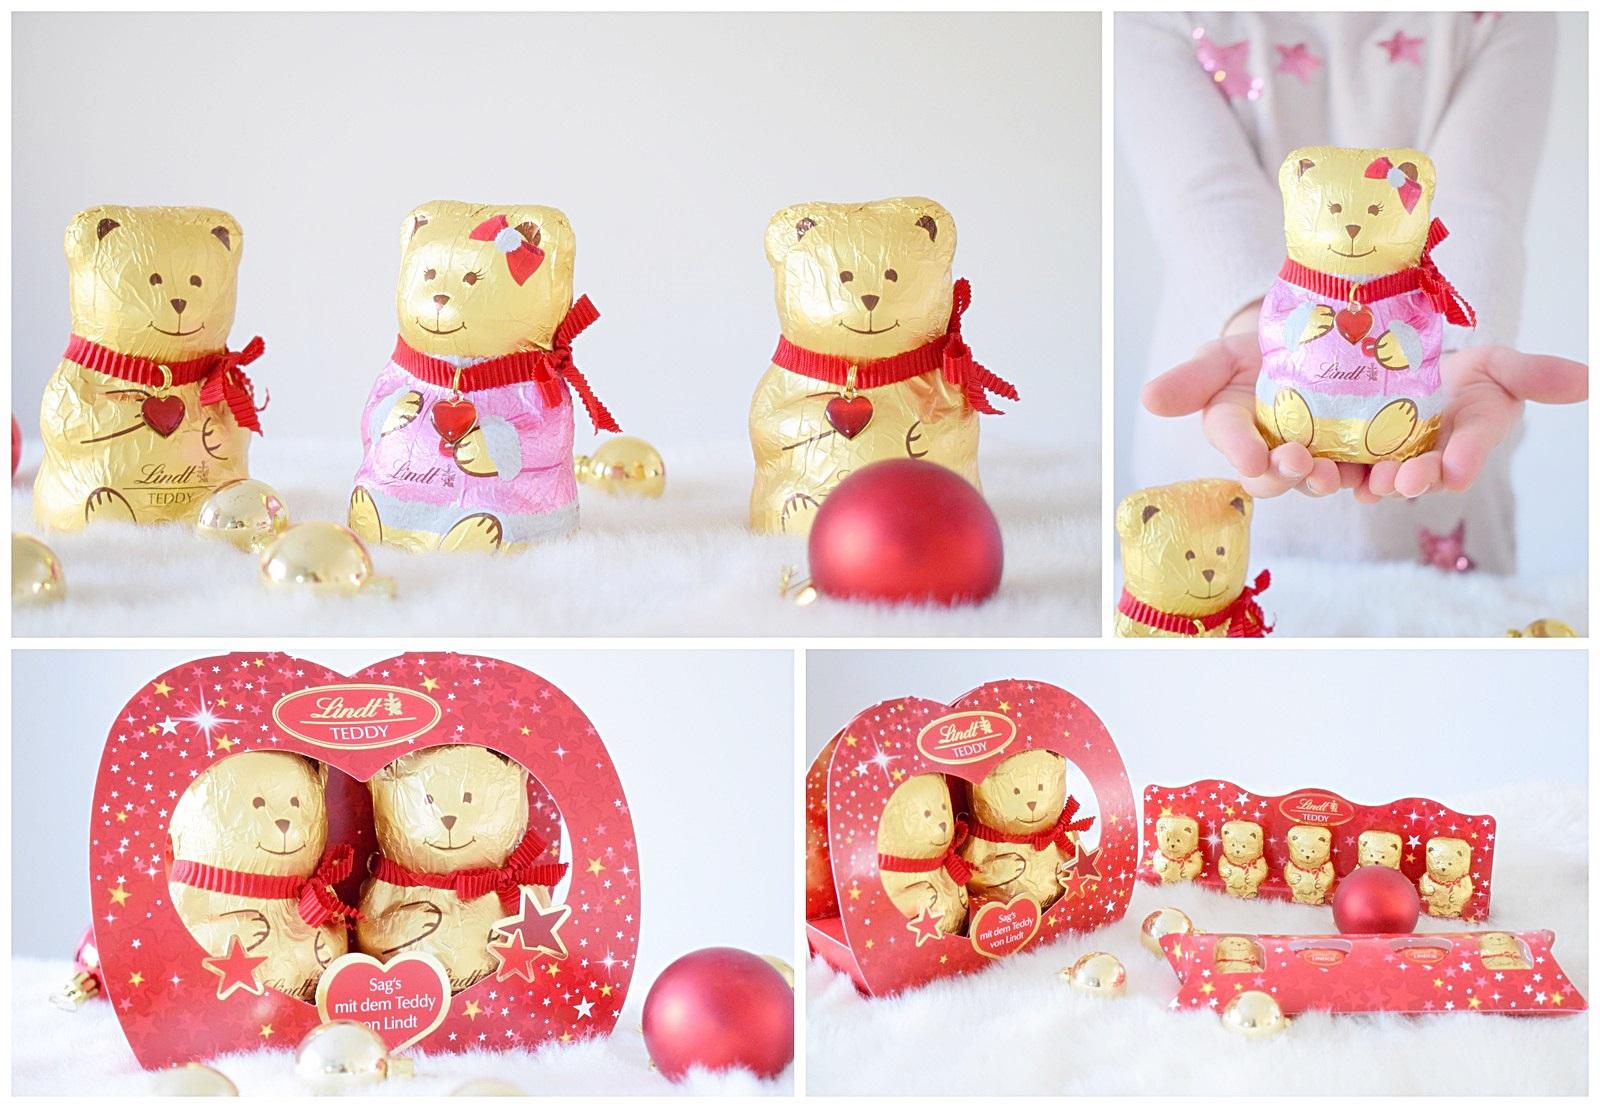 gewinnspiel-lindt-teddy-edition